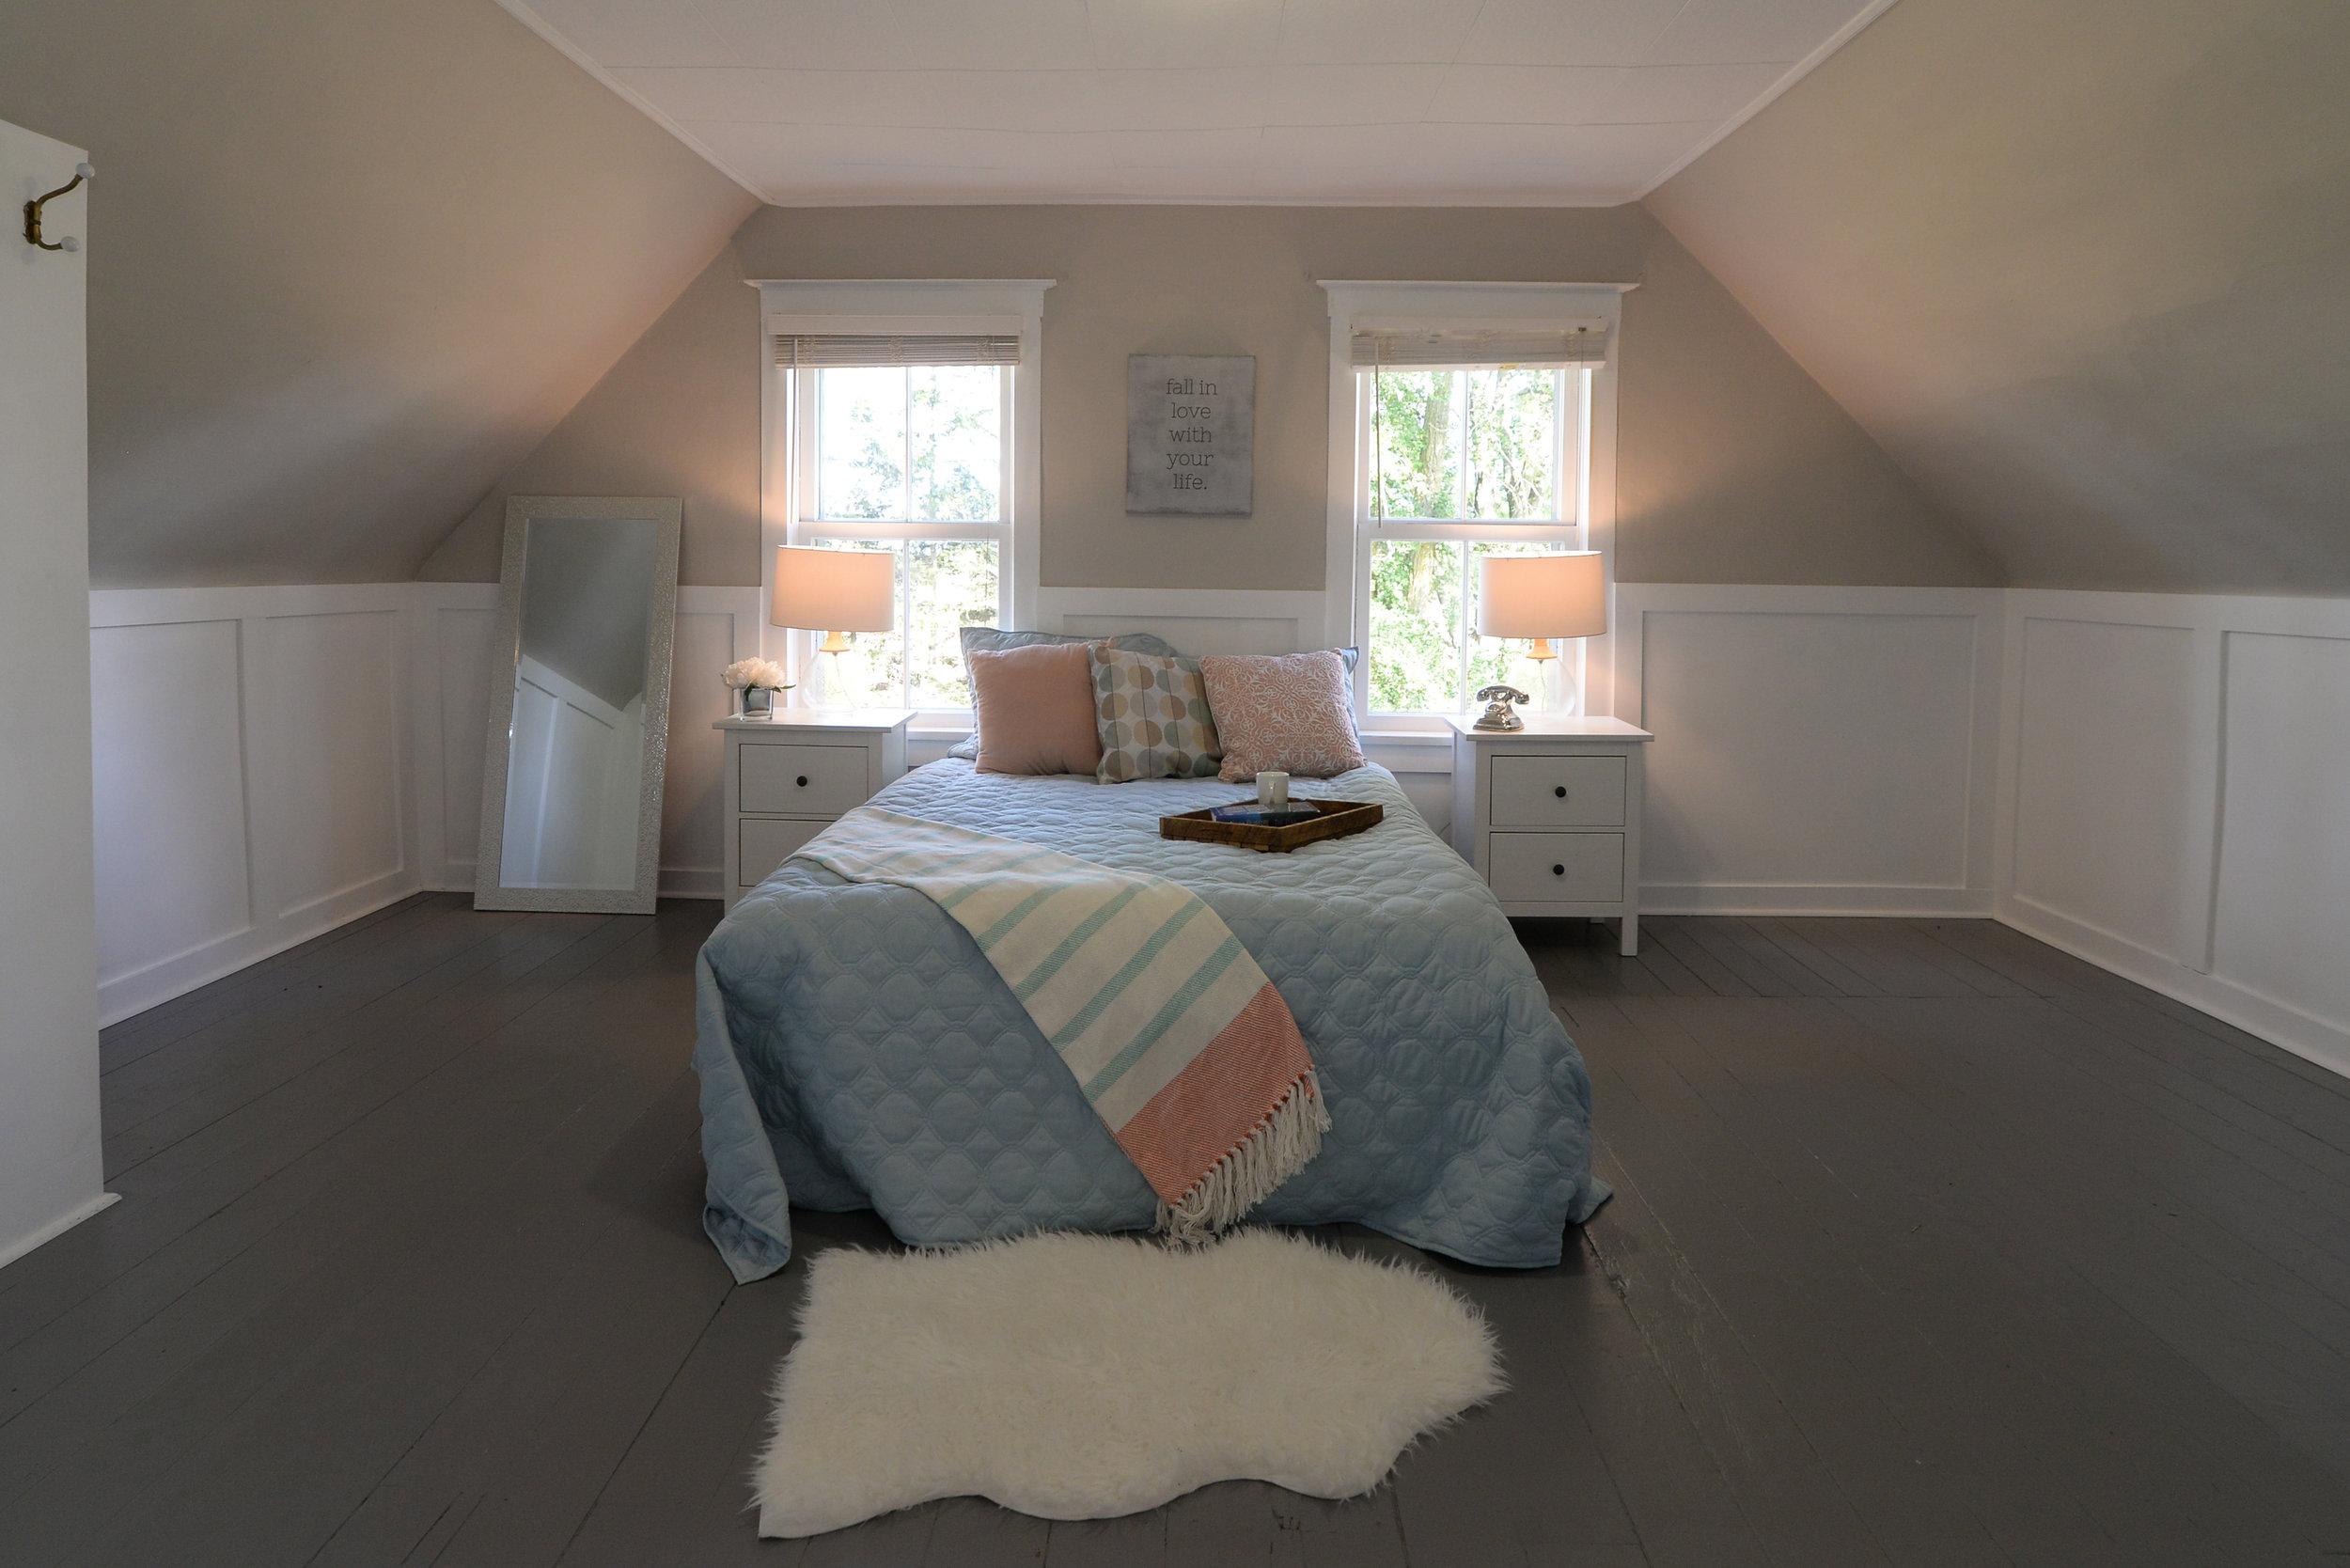 Bedroom B-Edit.jpg